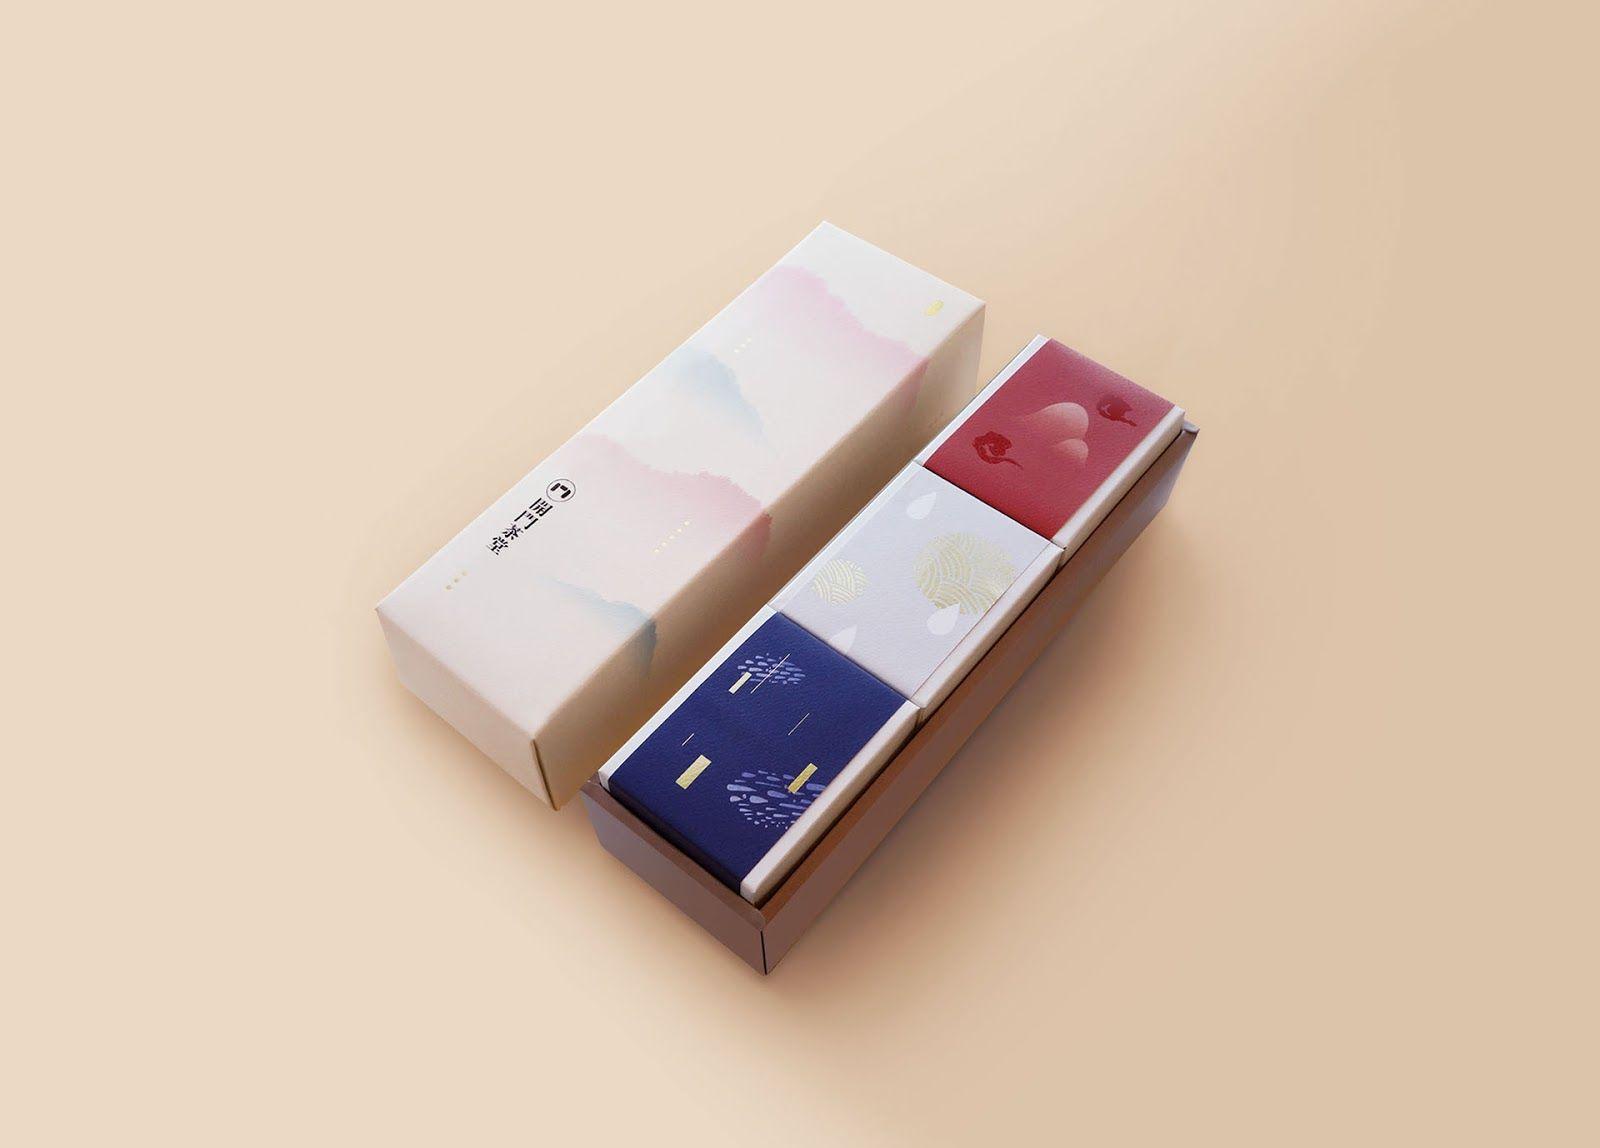 Kaimon Tea With Images Taiwan Tea Health Products Packaging Tea